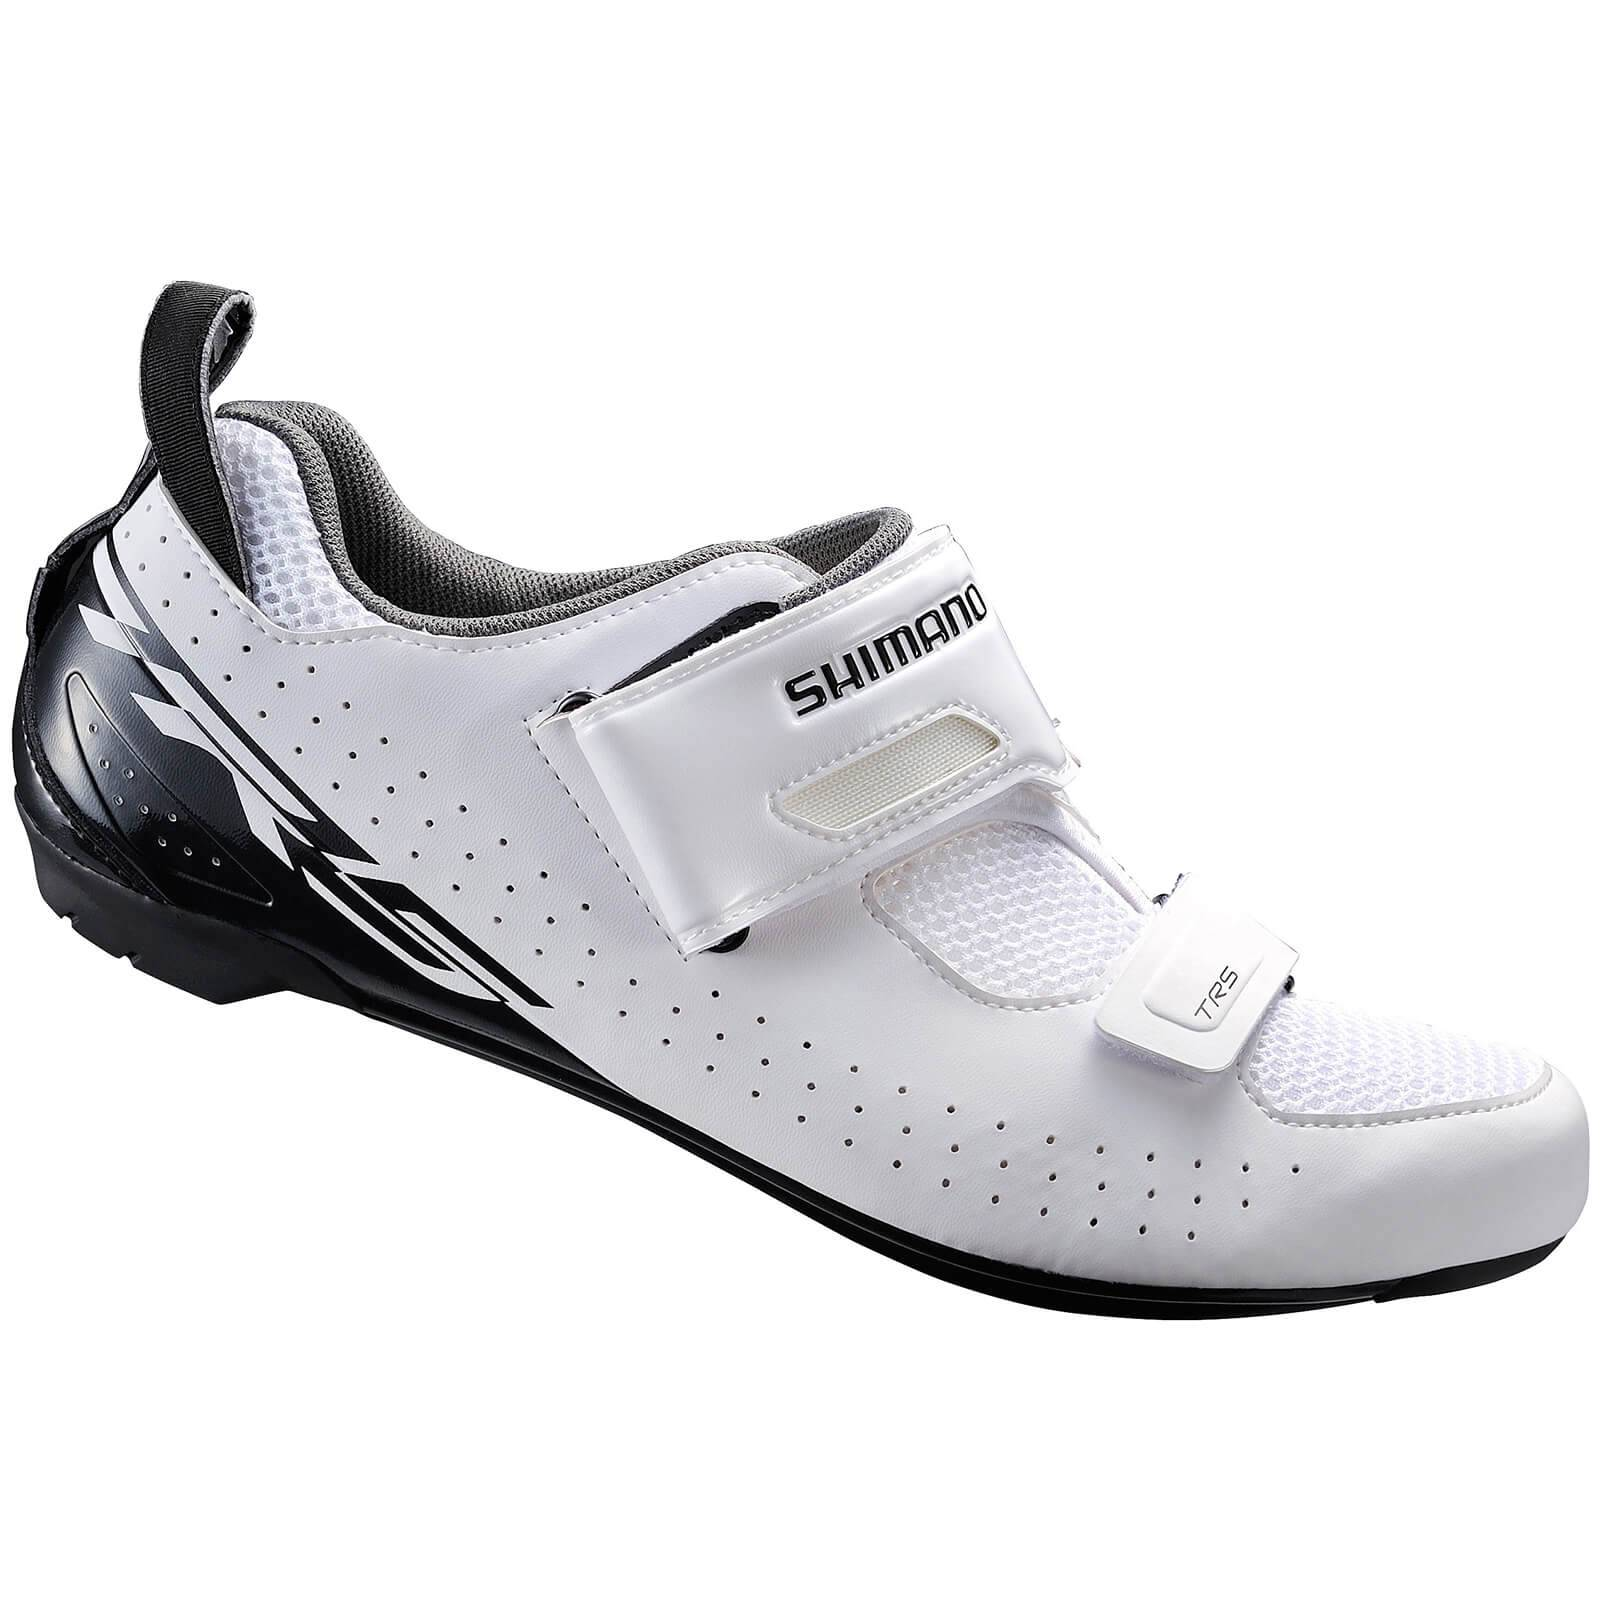 Shimano TR5 SPD-SL Triathlon Shoes - White - EU 48 - White